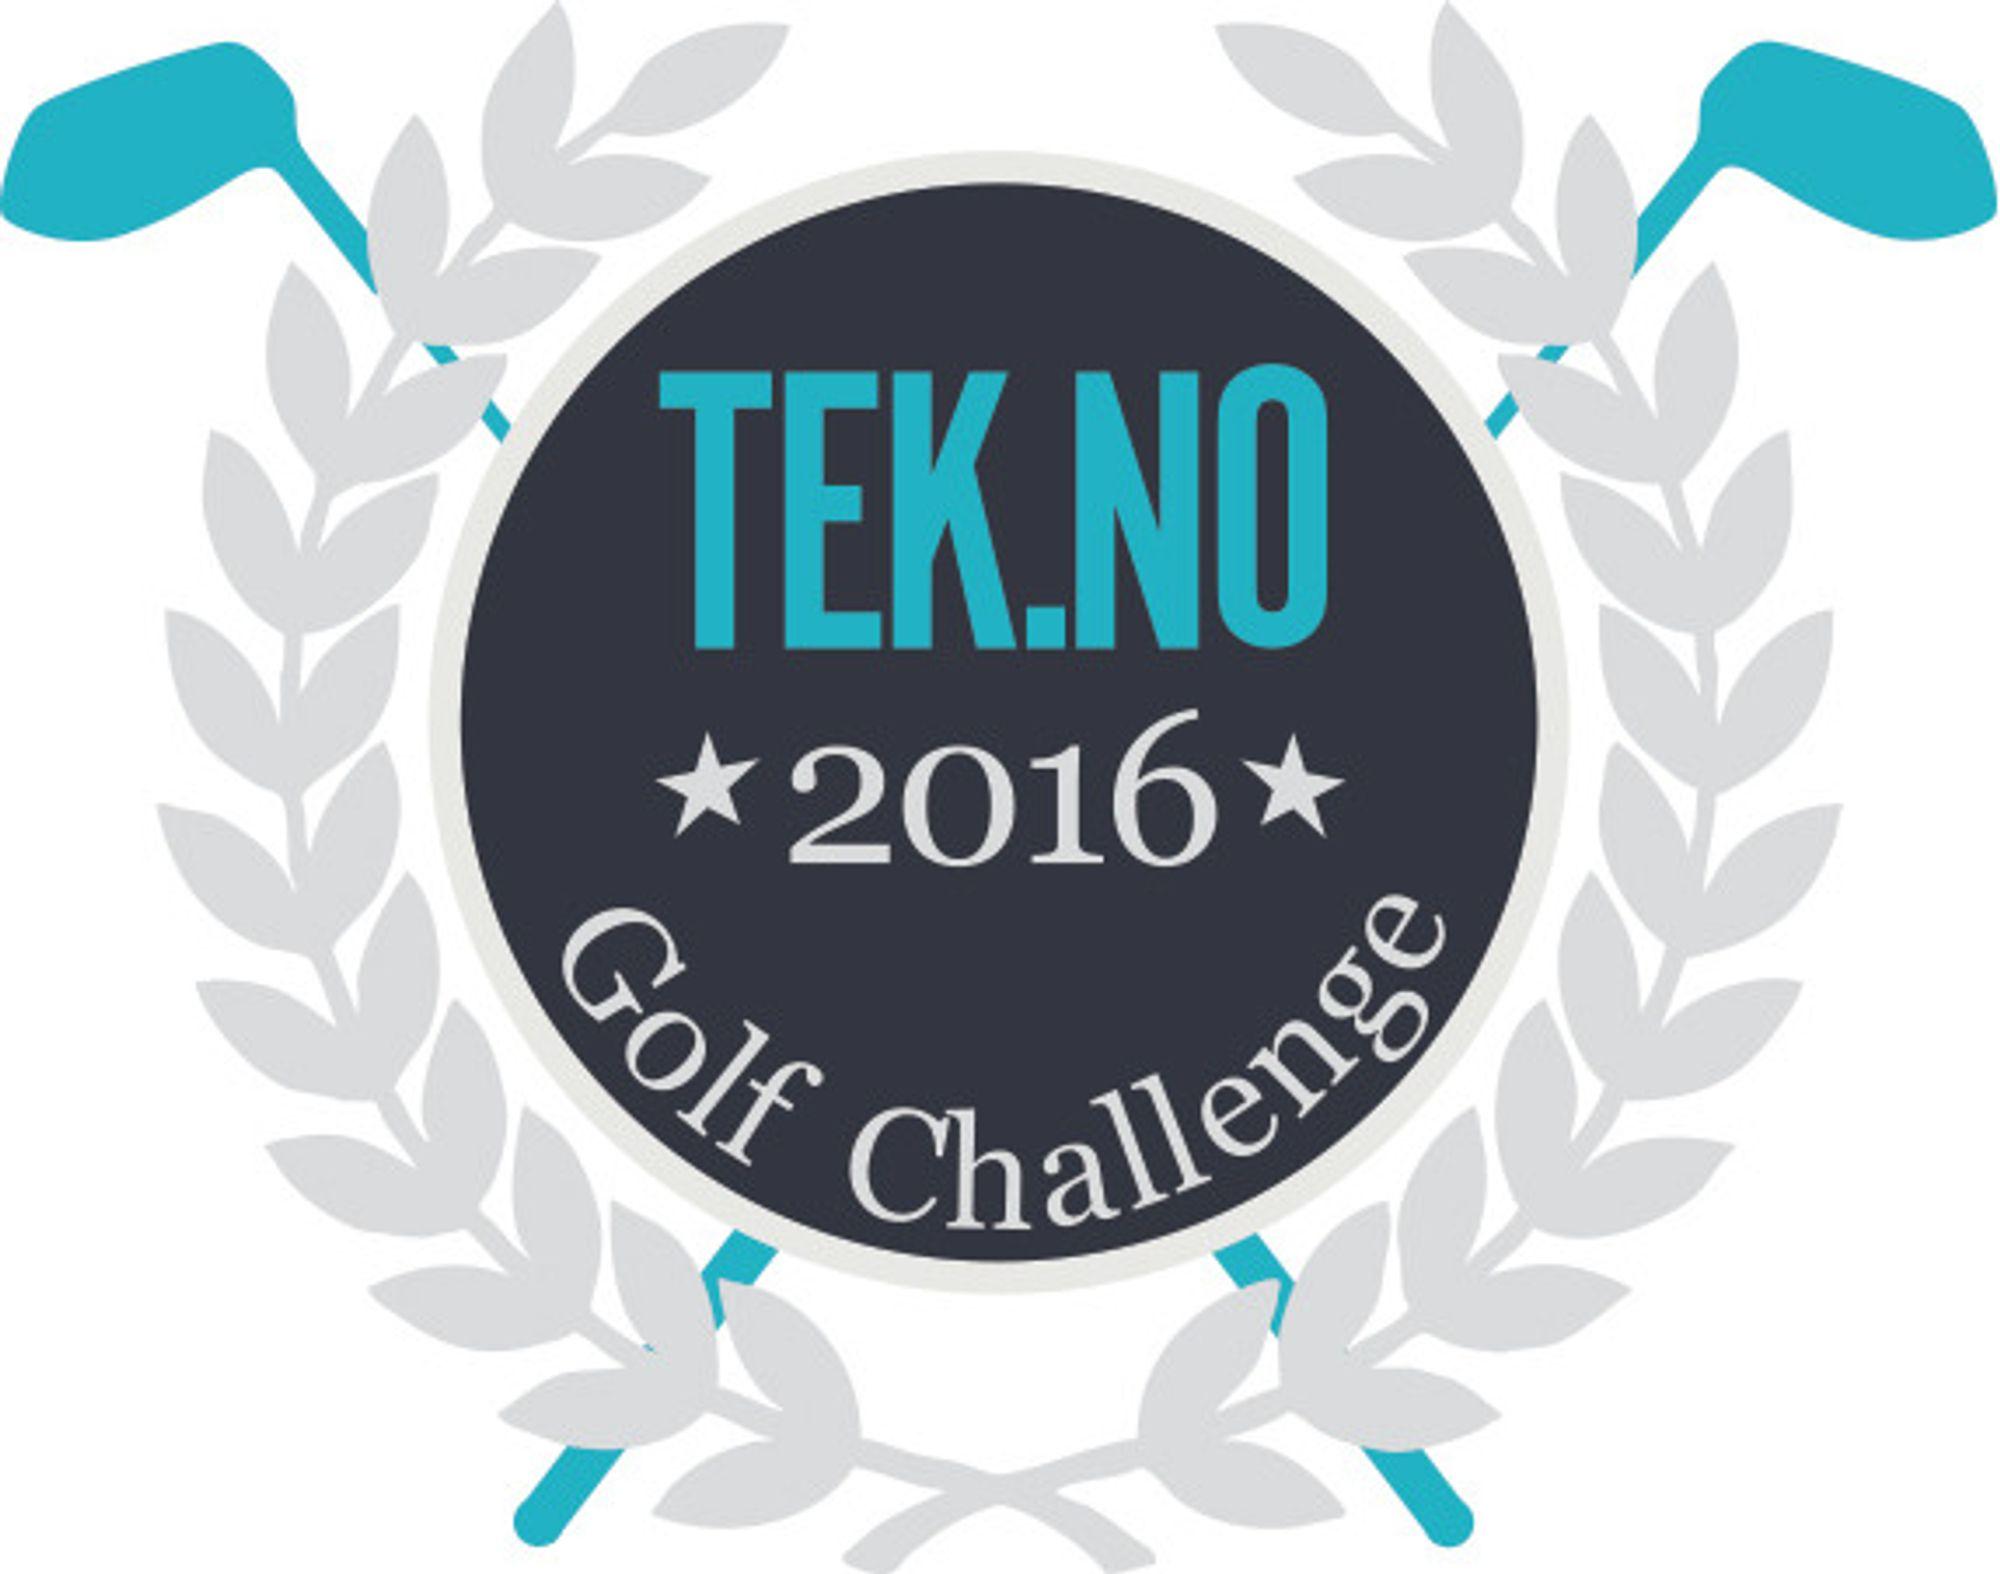 Tek.no Golf Challenge